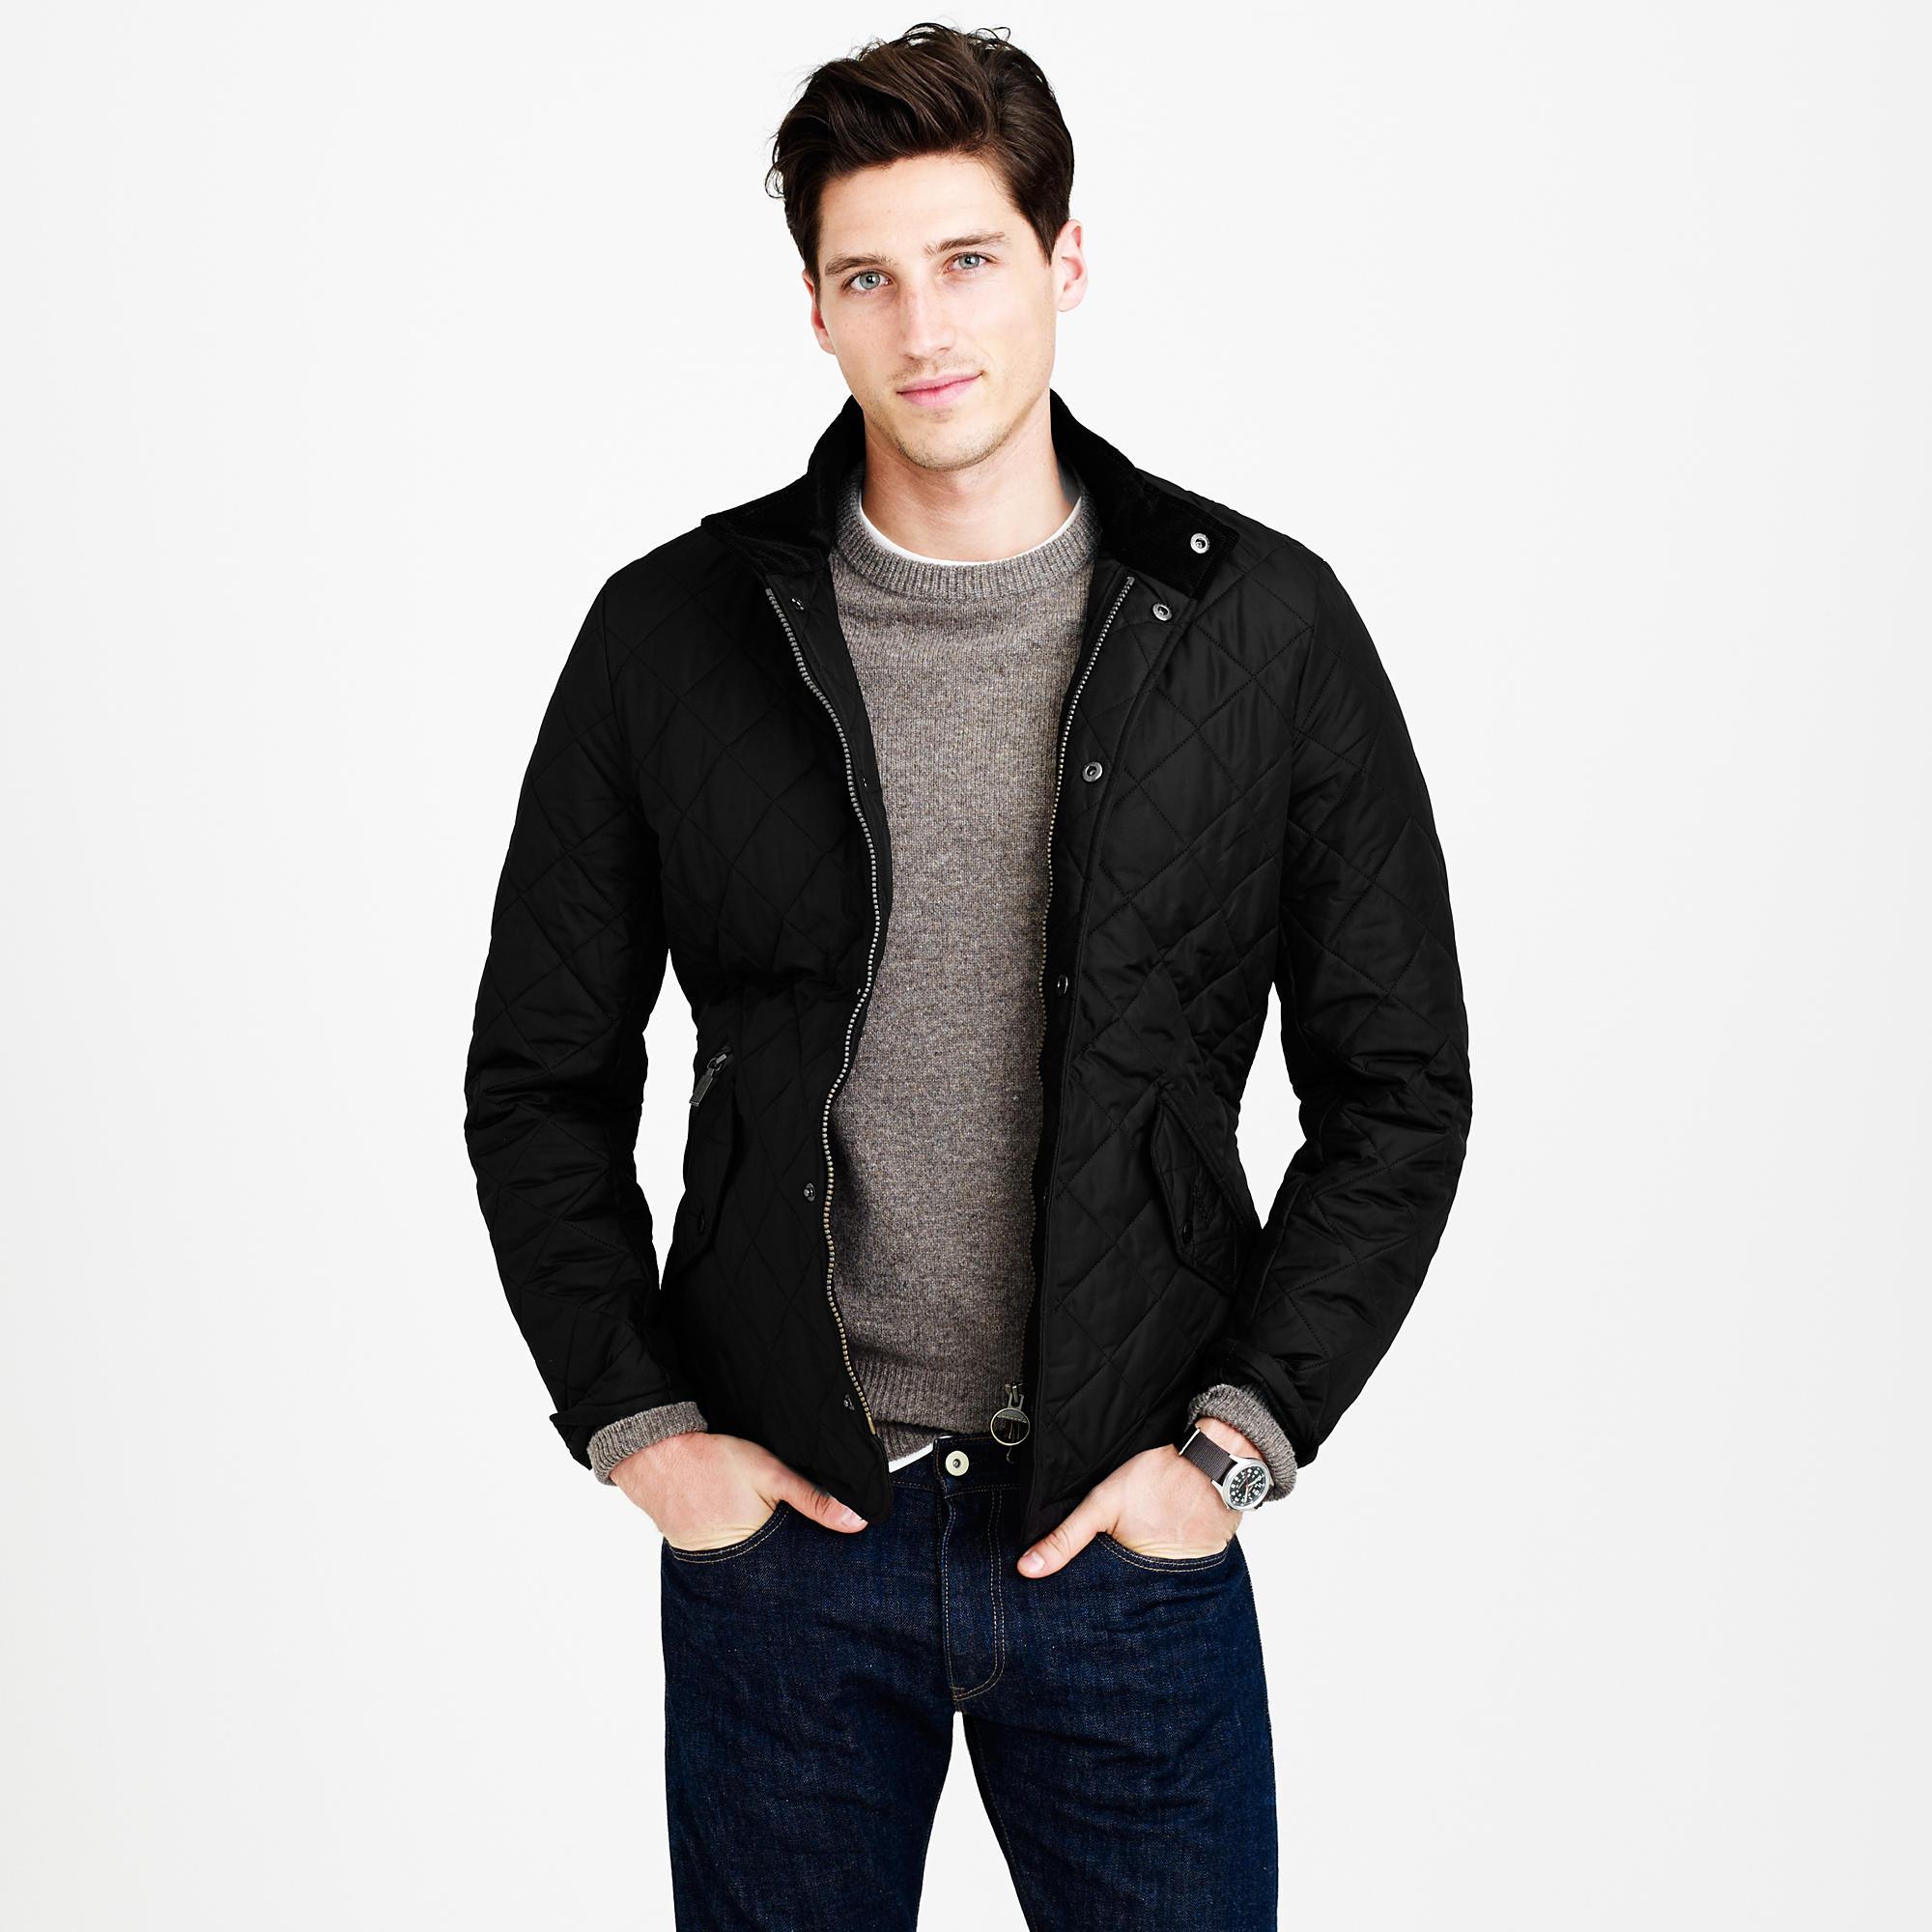 J.Crew Barbour® Chelsea Sportsquilt Jacket | 10 Fall Wardrobe Essentials for Men